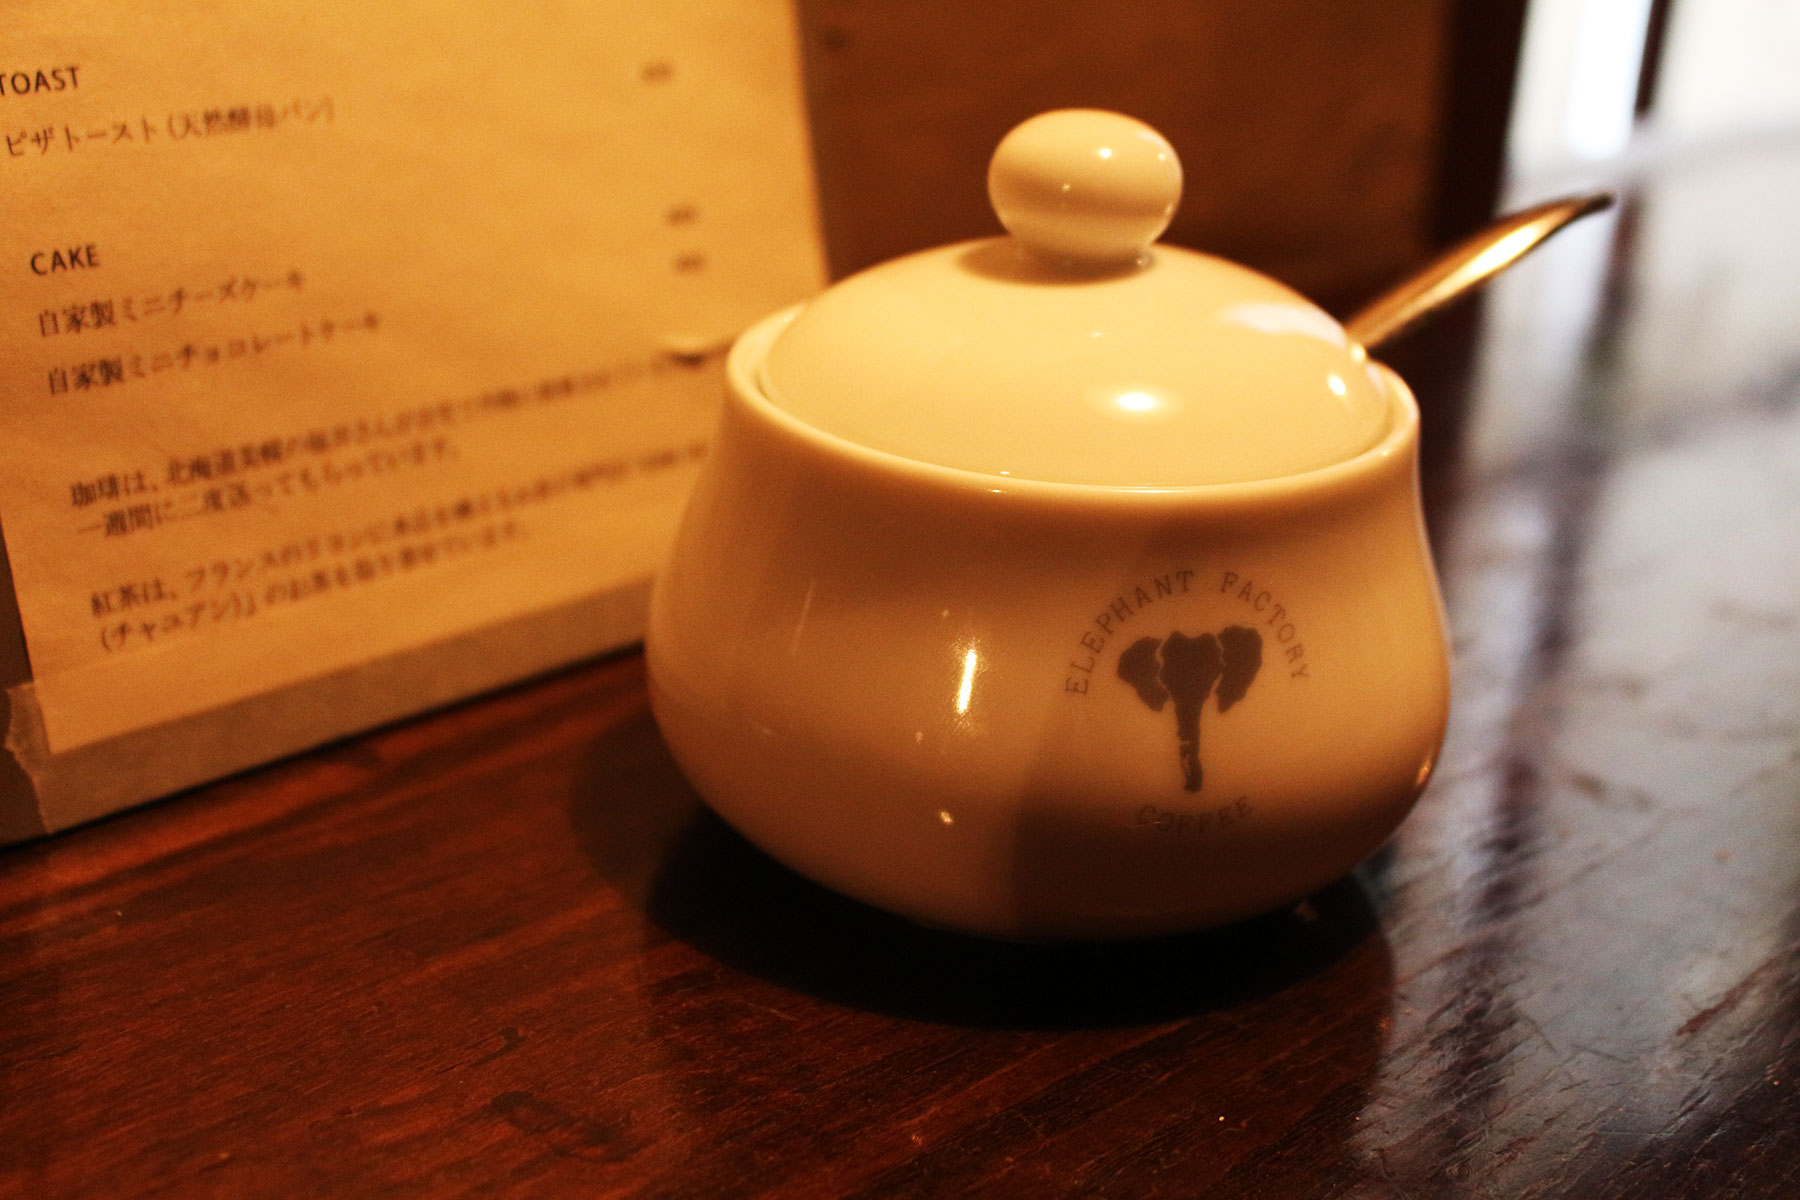 ELEPHANT FACTORY COFFEE (エレファントファクトリーコーヒー) 京都